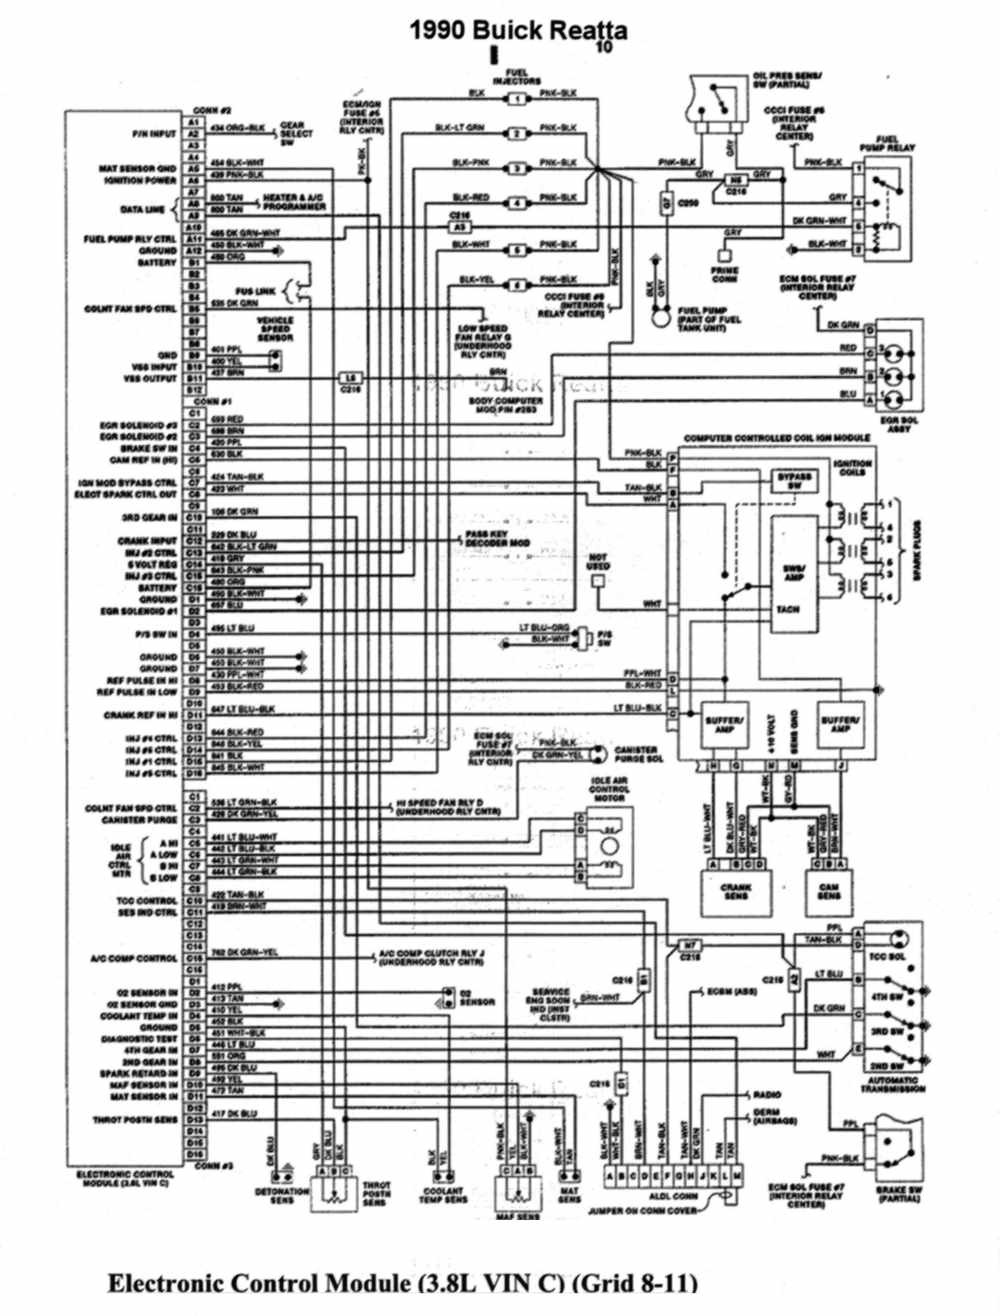 1990 buick reatta fuse box diagram enthusiast wiring diagrams u2022 rh rasalibre co 1996 Buick Century Wiring-Diagram 1990 buick century radio wiring diagram